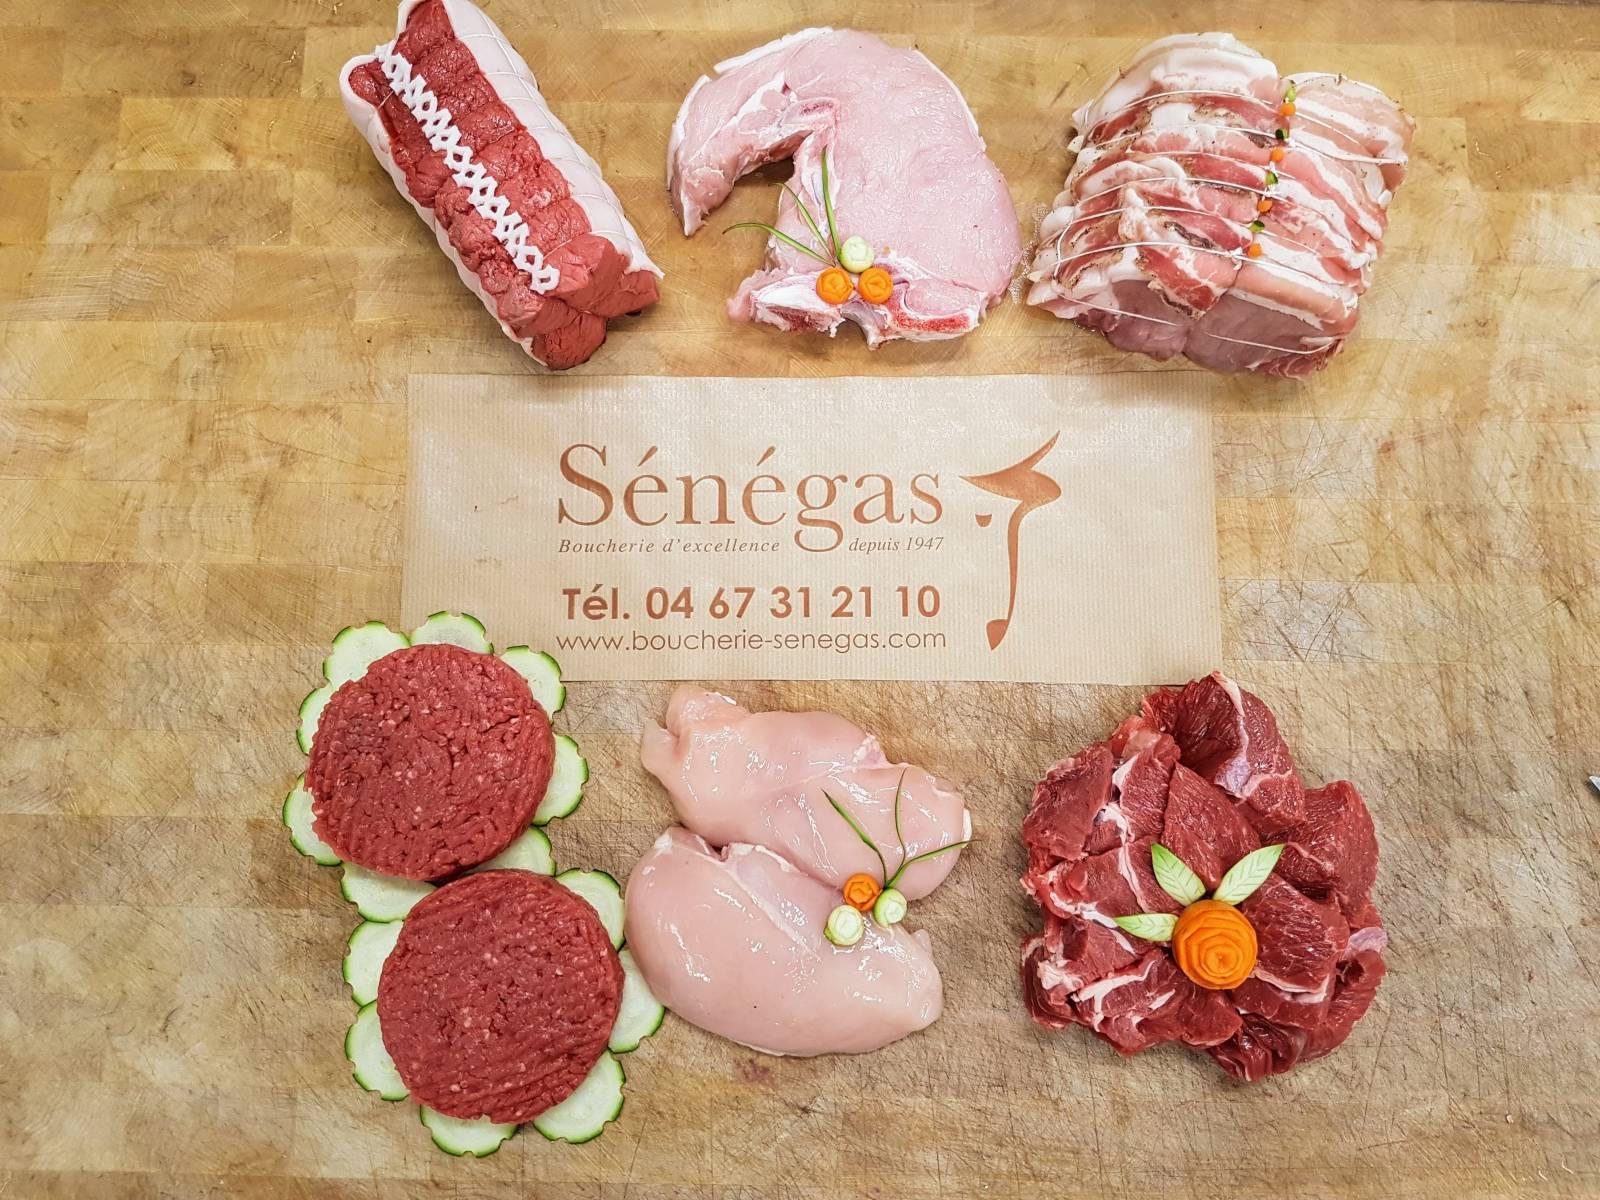 boucherie-senegas-colis-gourmand